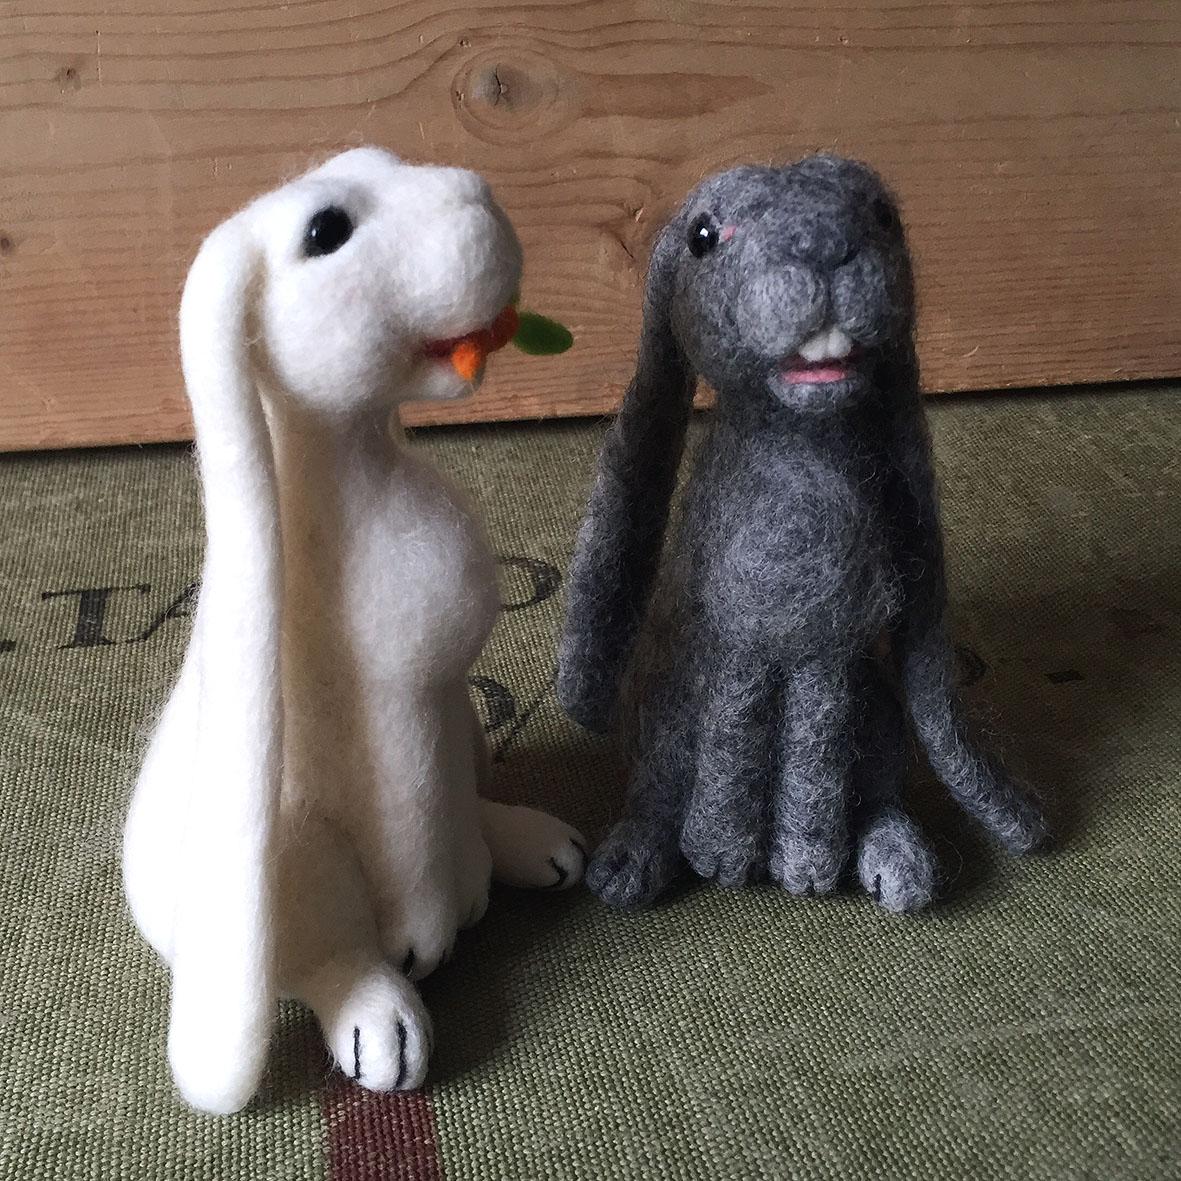 Spring Hares needle felting class